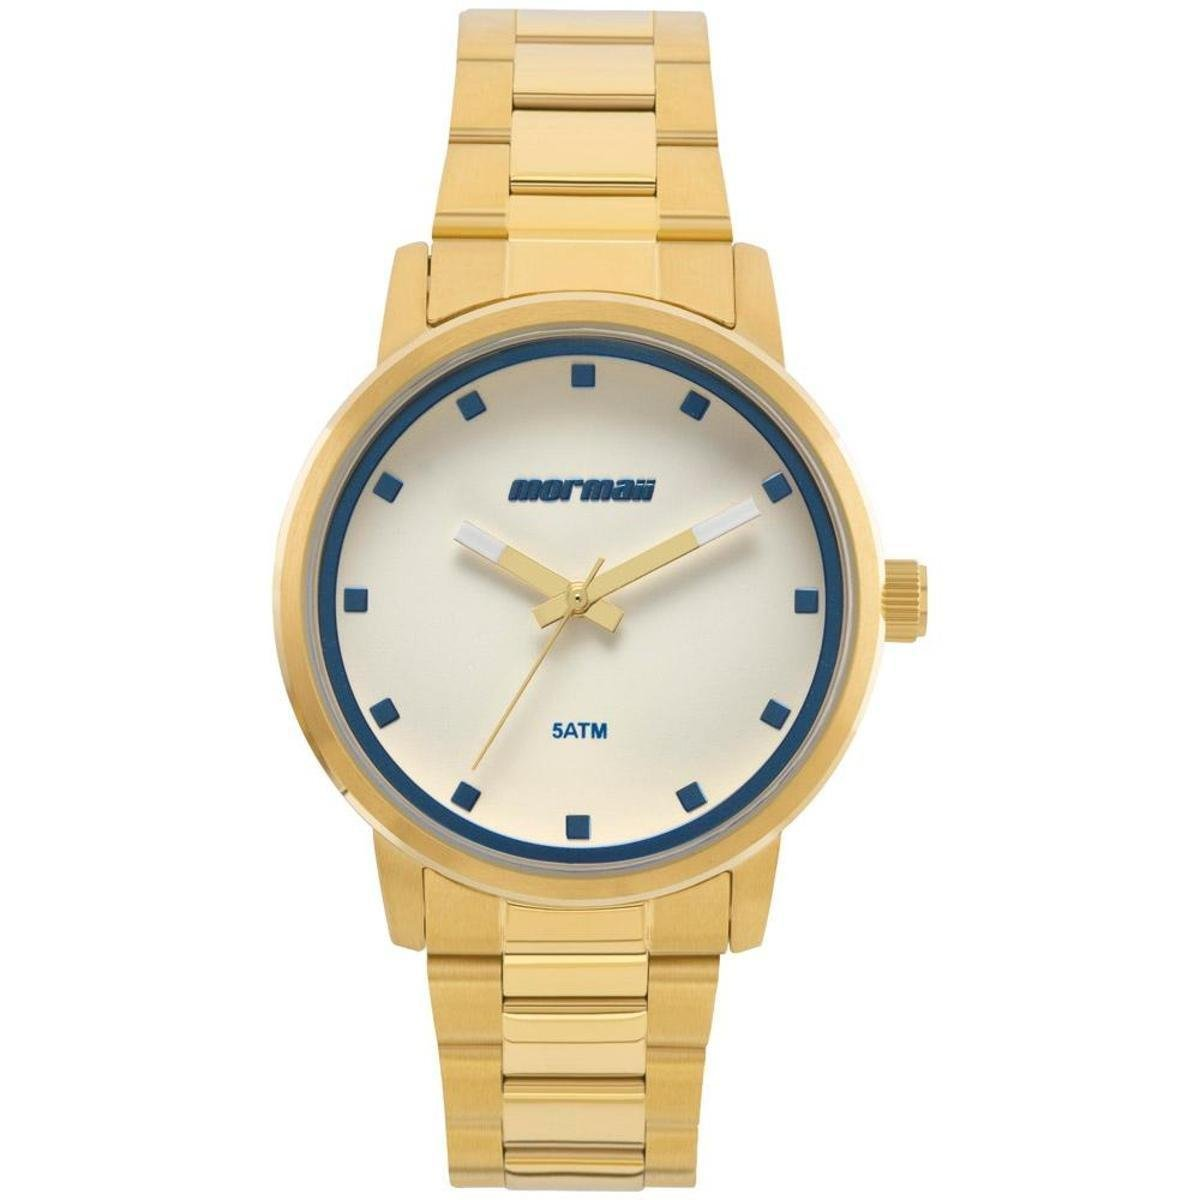 ad19f72703ee9 Relógio Mormaii Feminino Mauii- Mo2035ja 4a - Dourado - Compre Agora ...